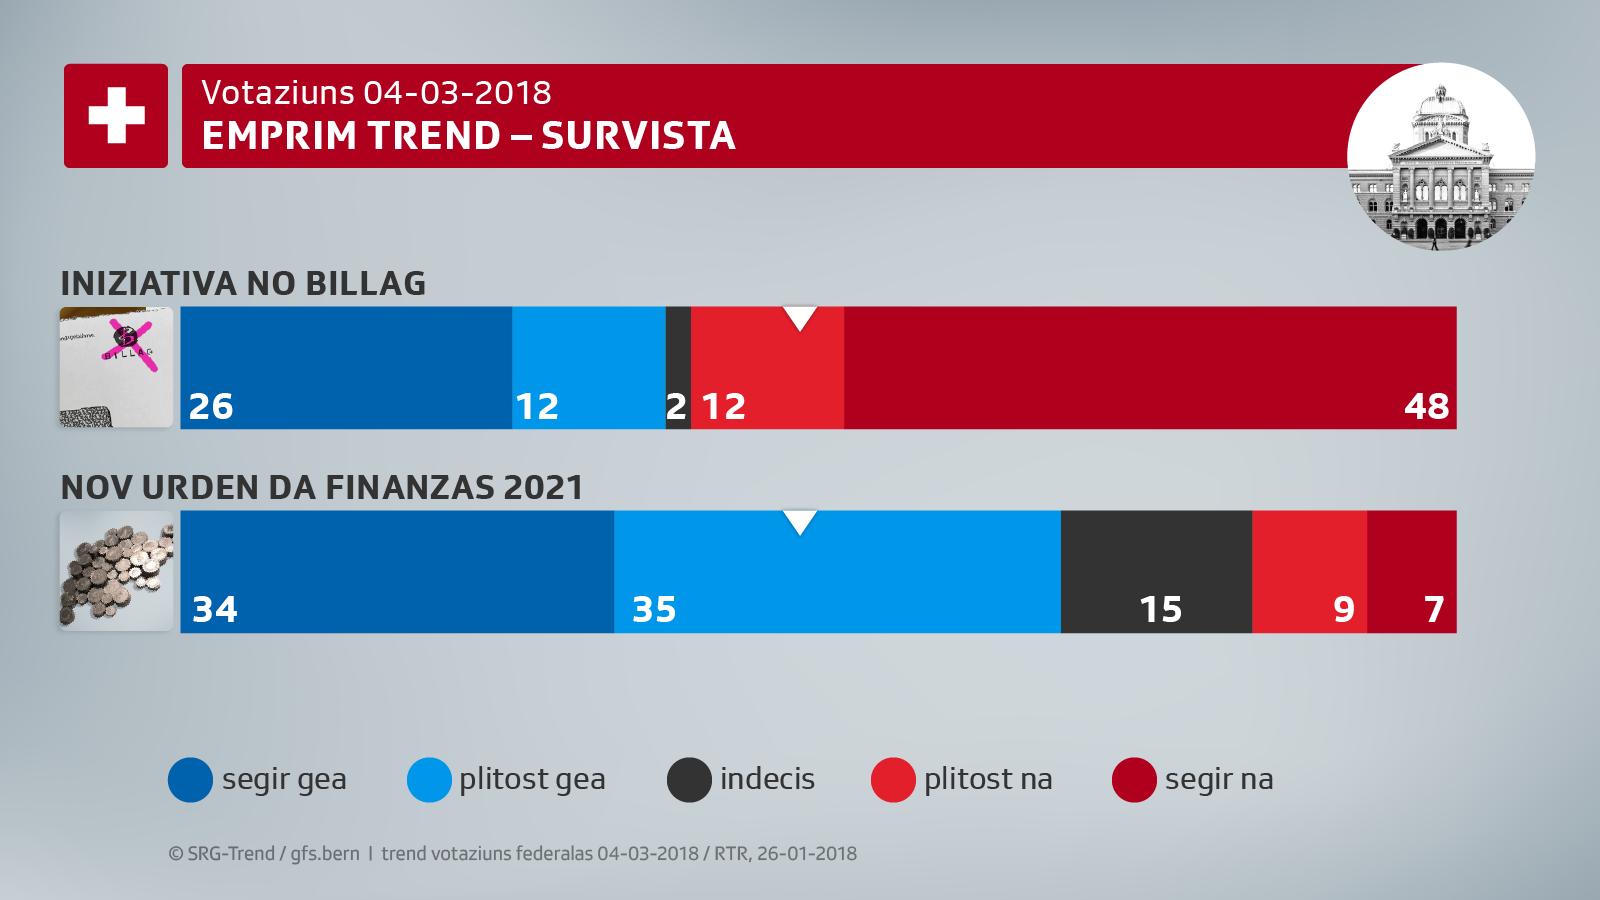 Retschertga gfs: La Svizra avess ditg na a No Billag, gea ad urden da finanzas